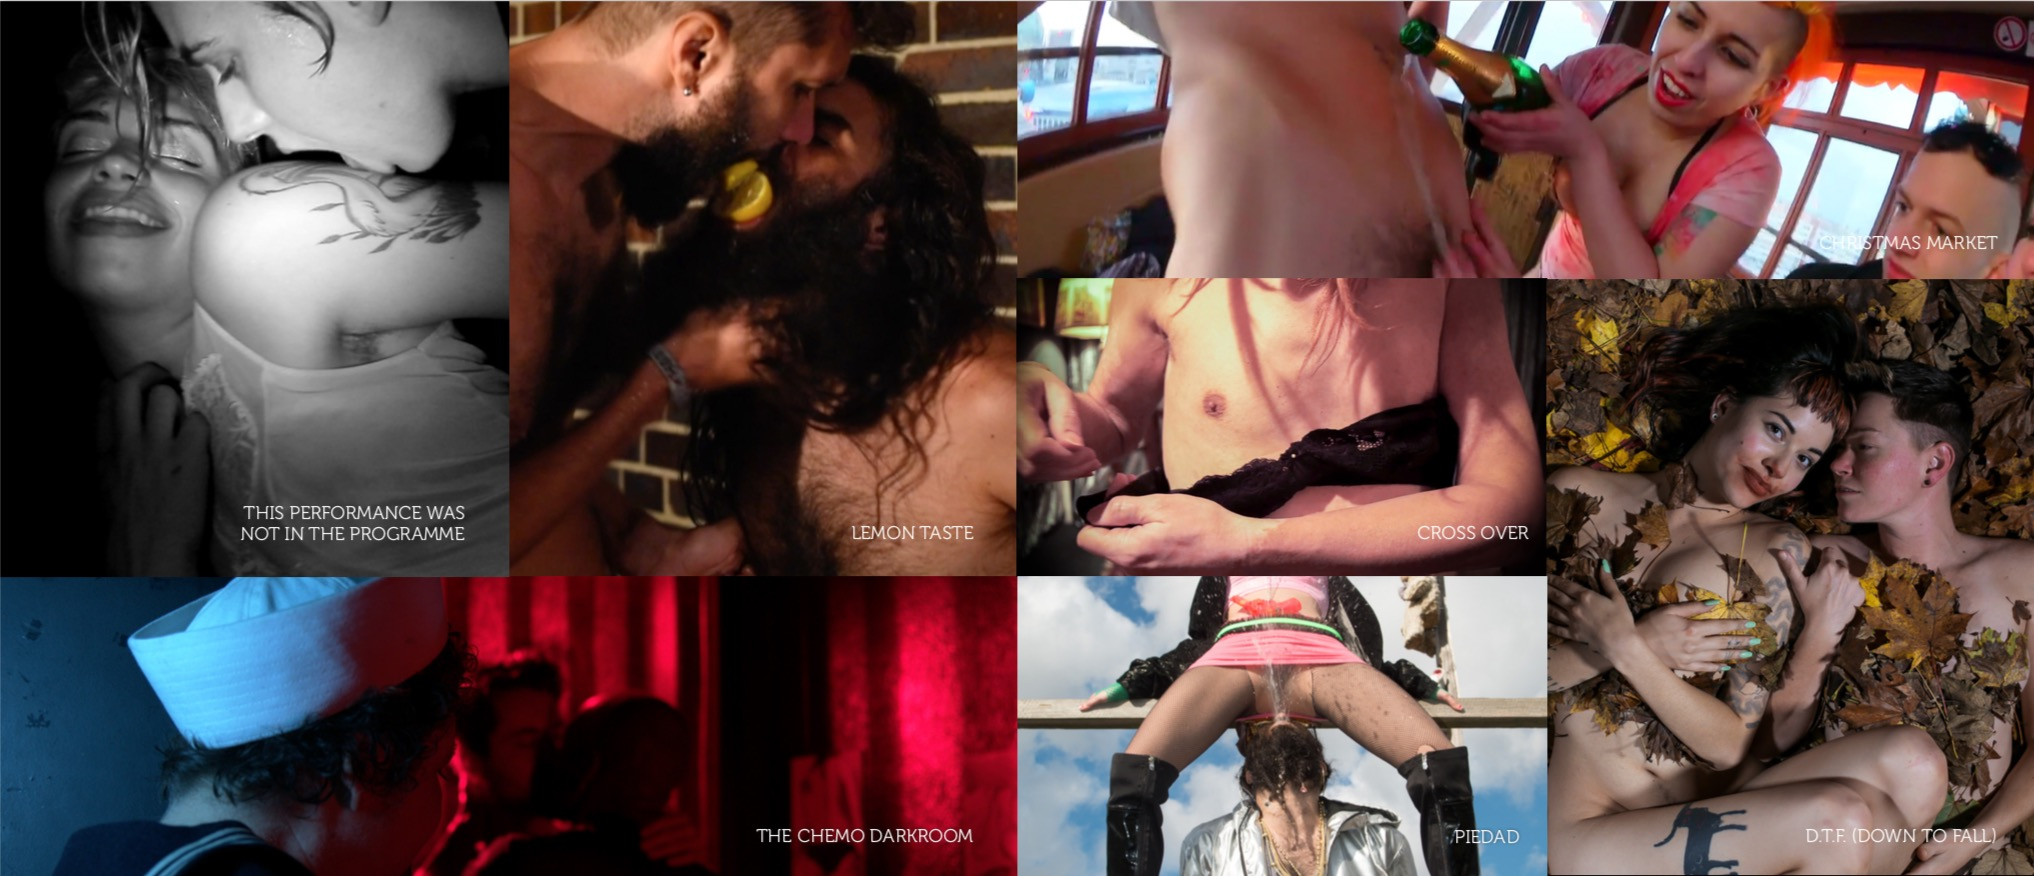 Porno Dokumentarfilm